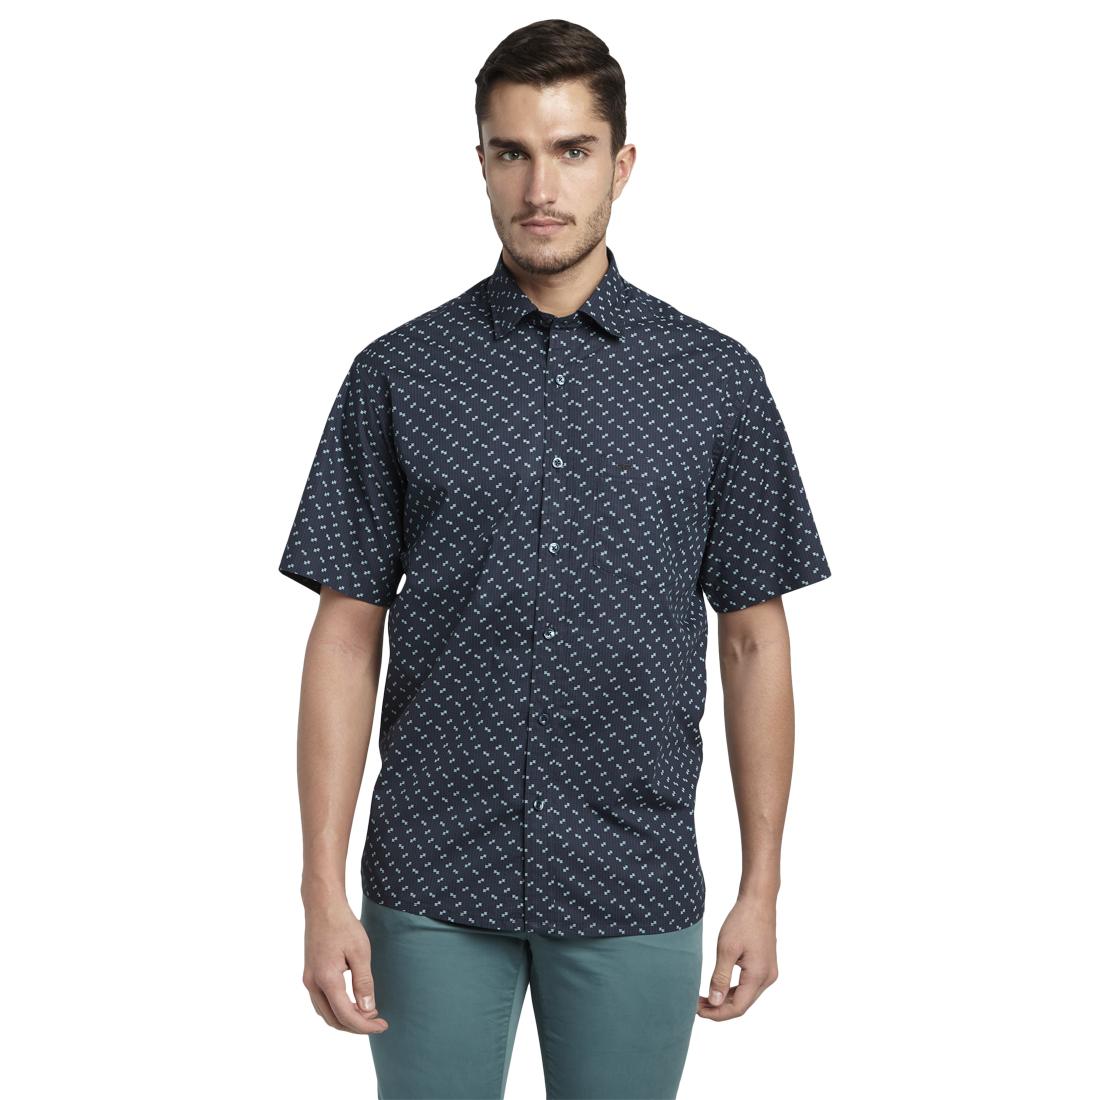 ColorPlus | ColorPlus Black Regular Fit Shirts